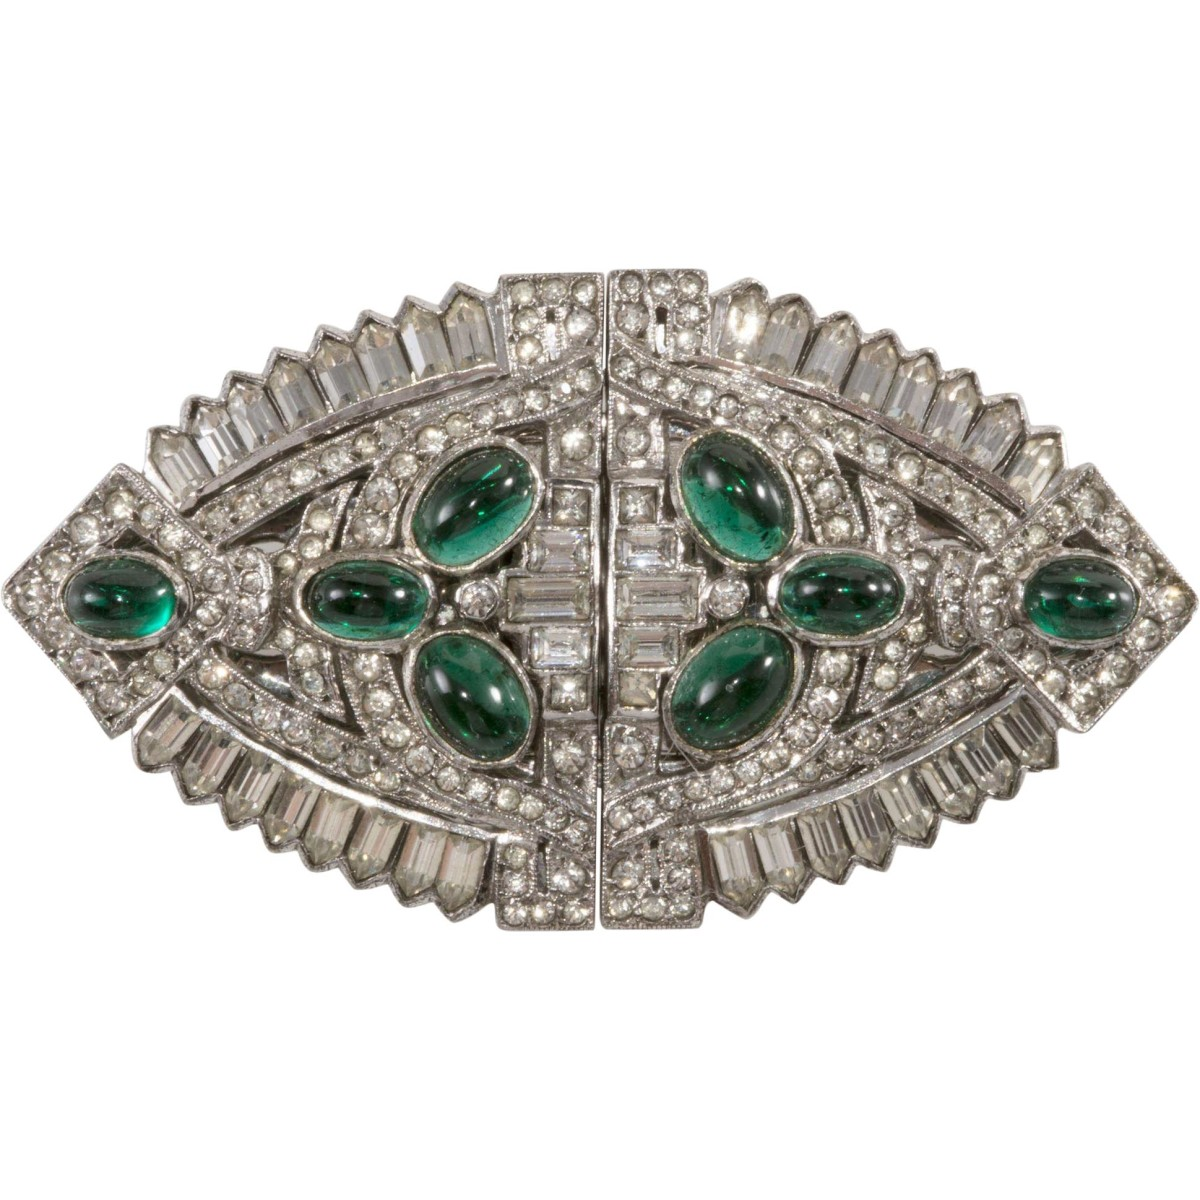 Ciner sterling silver 'duette brooch'